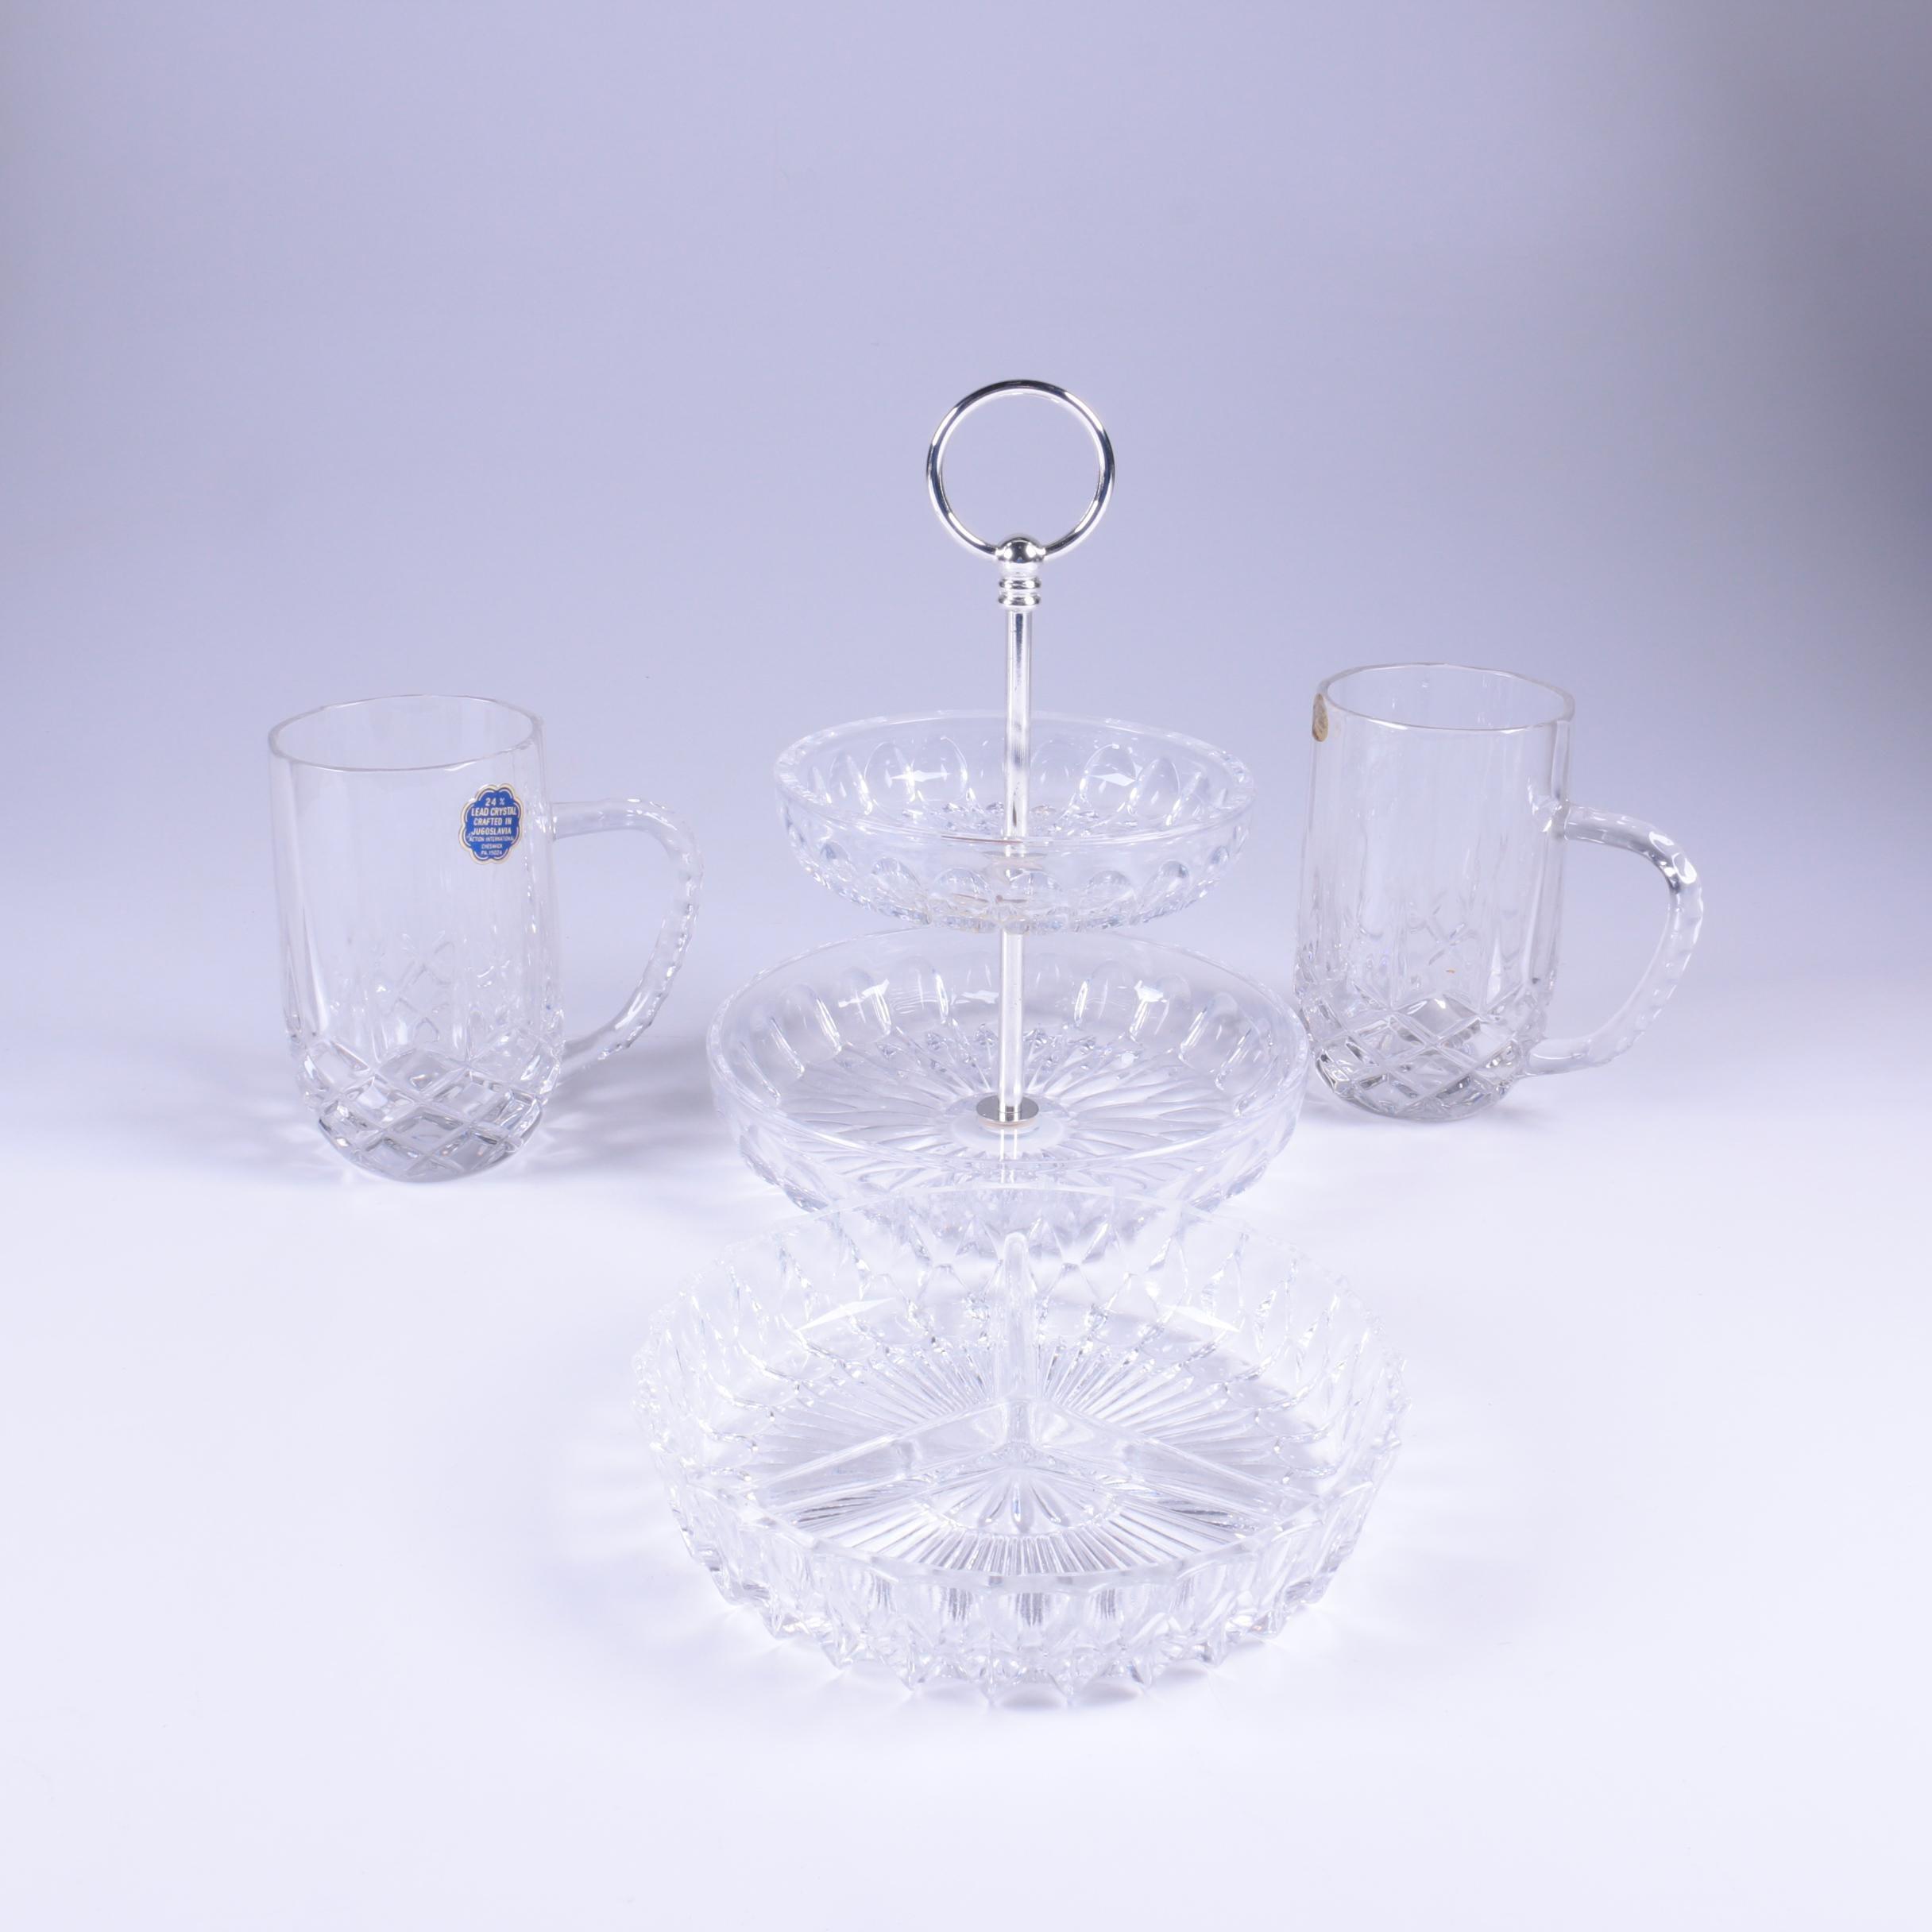 Crystal Tableware Featuring Gorham